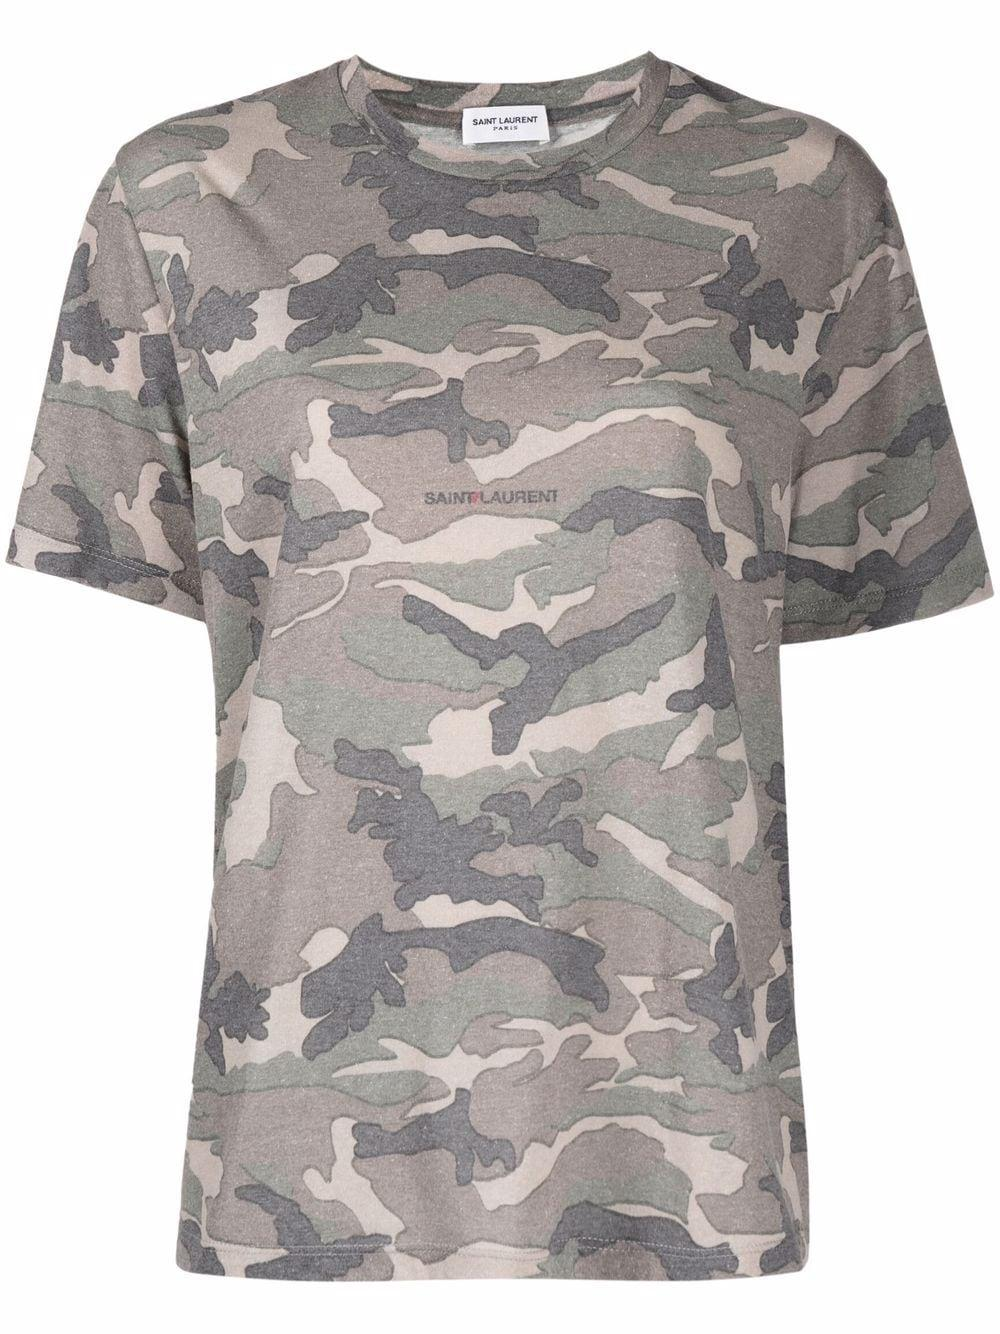 Camo Print T- Shirt Item # 665224Y36IT